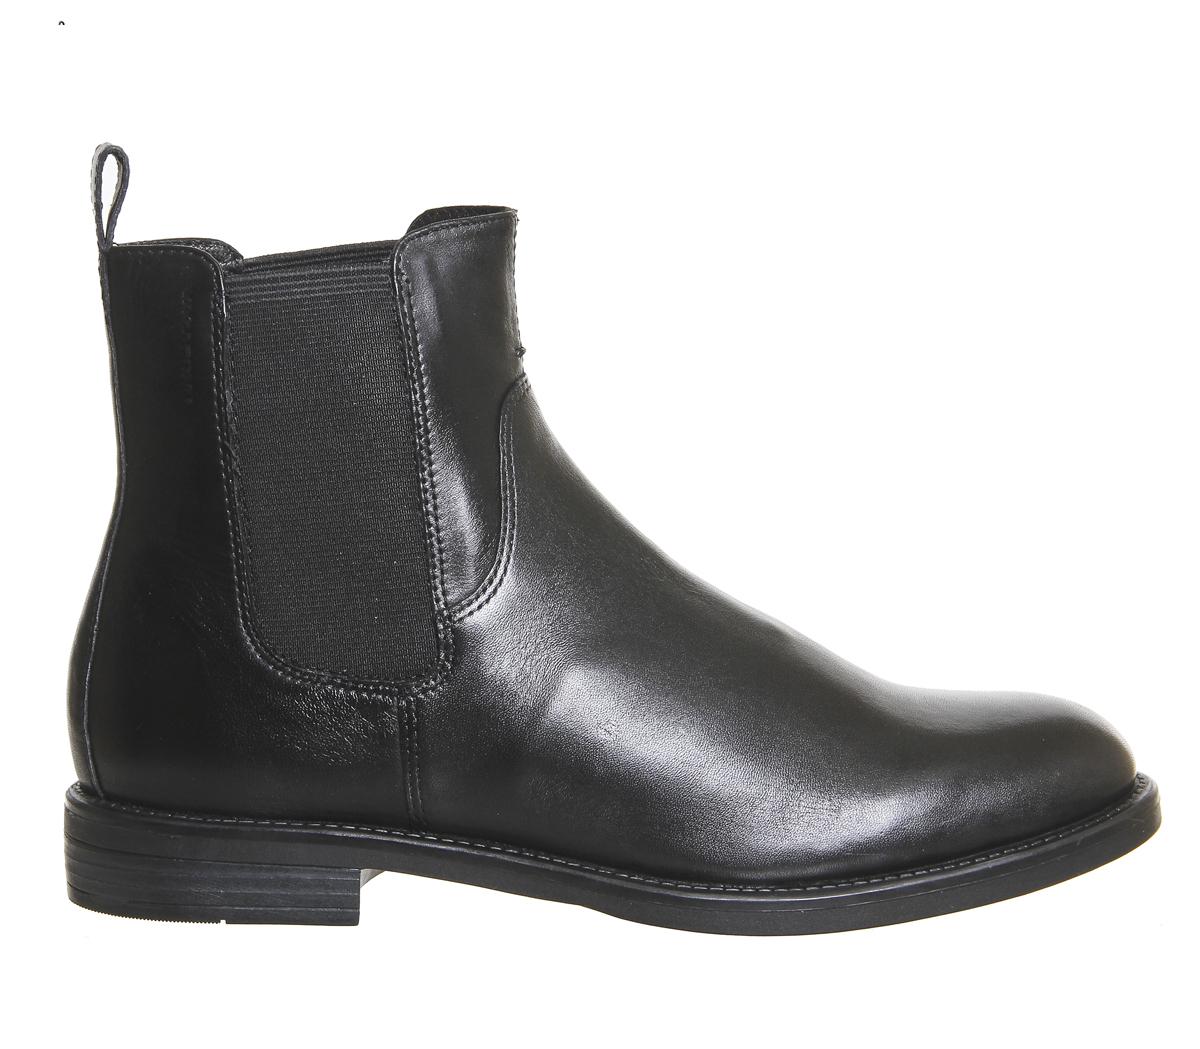 Damenschuhe Chelsea Vagabond Amina Chelsea Damenschuhe Stiefel BLACK LEATHER Stiefel ea5dfd